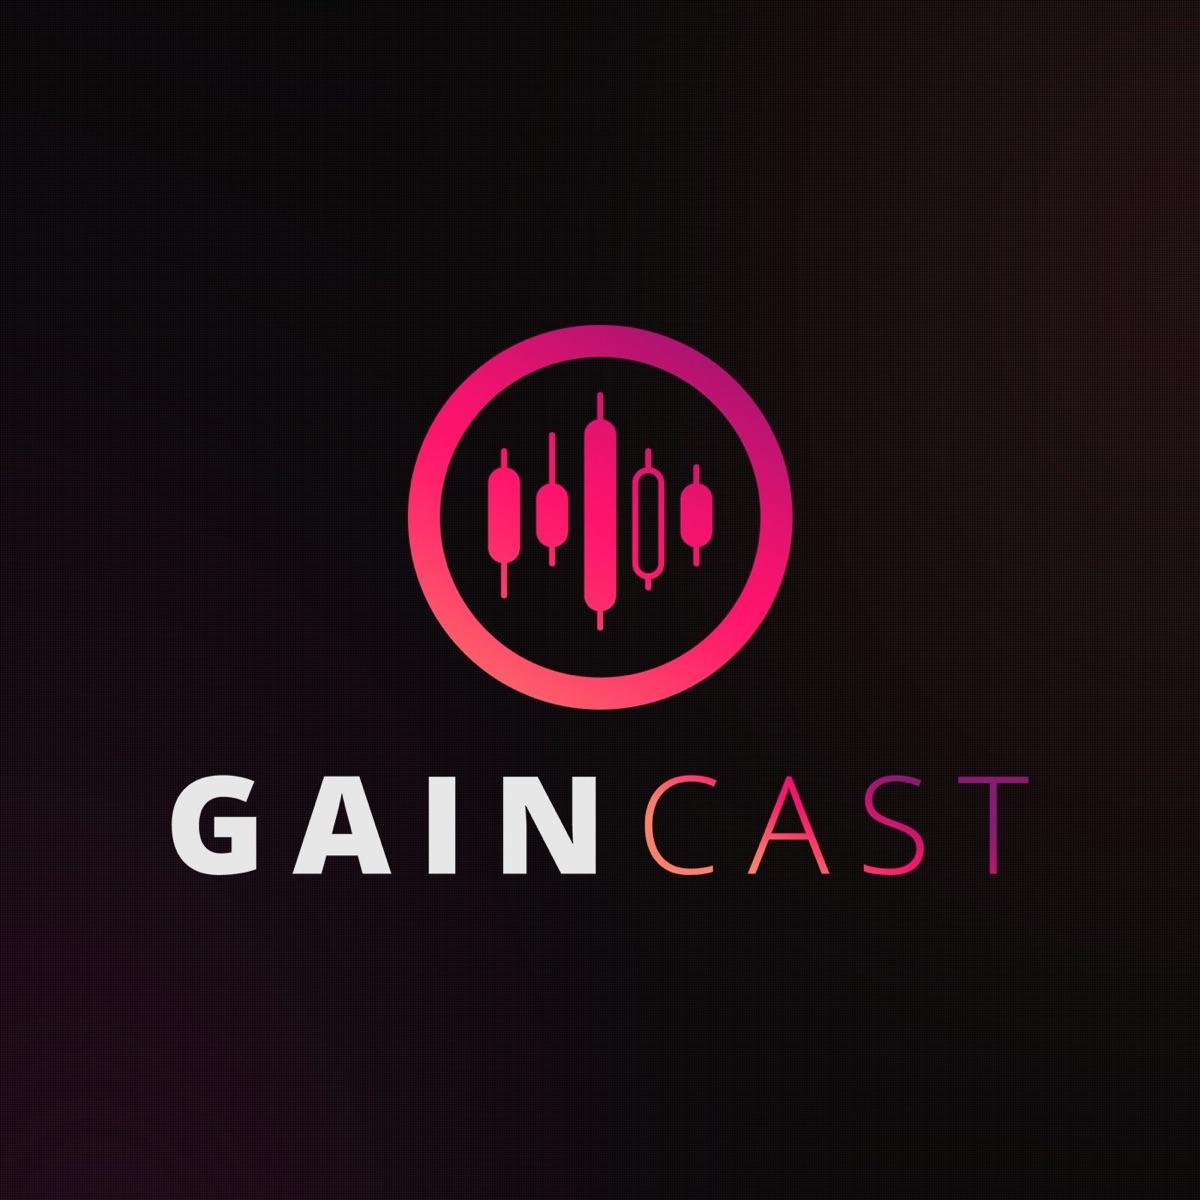 GainCast - Bolsa de Valores sem mimimi